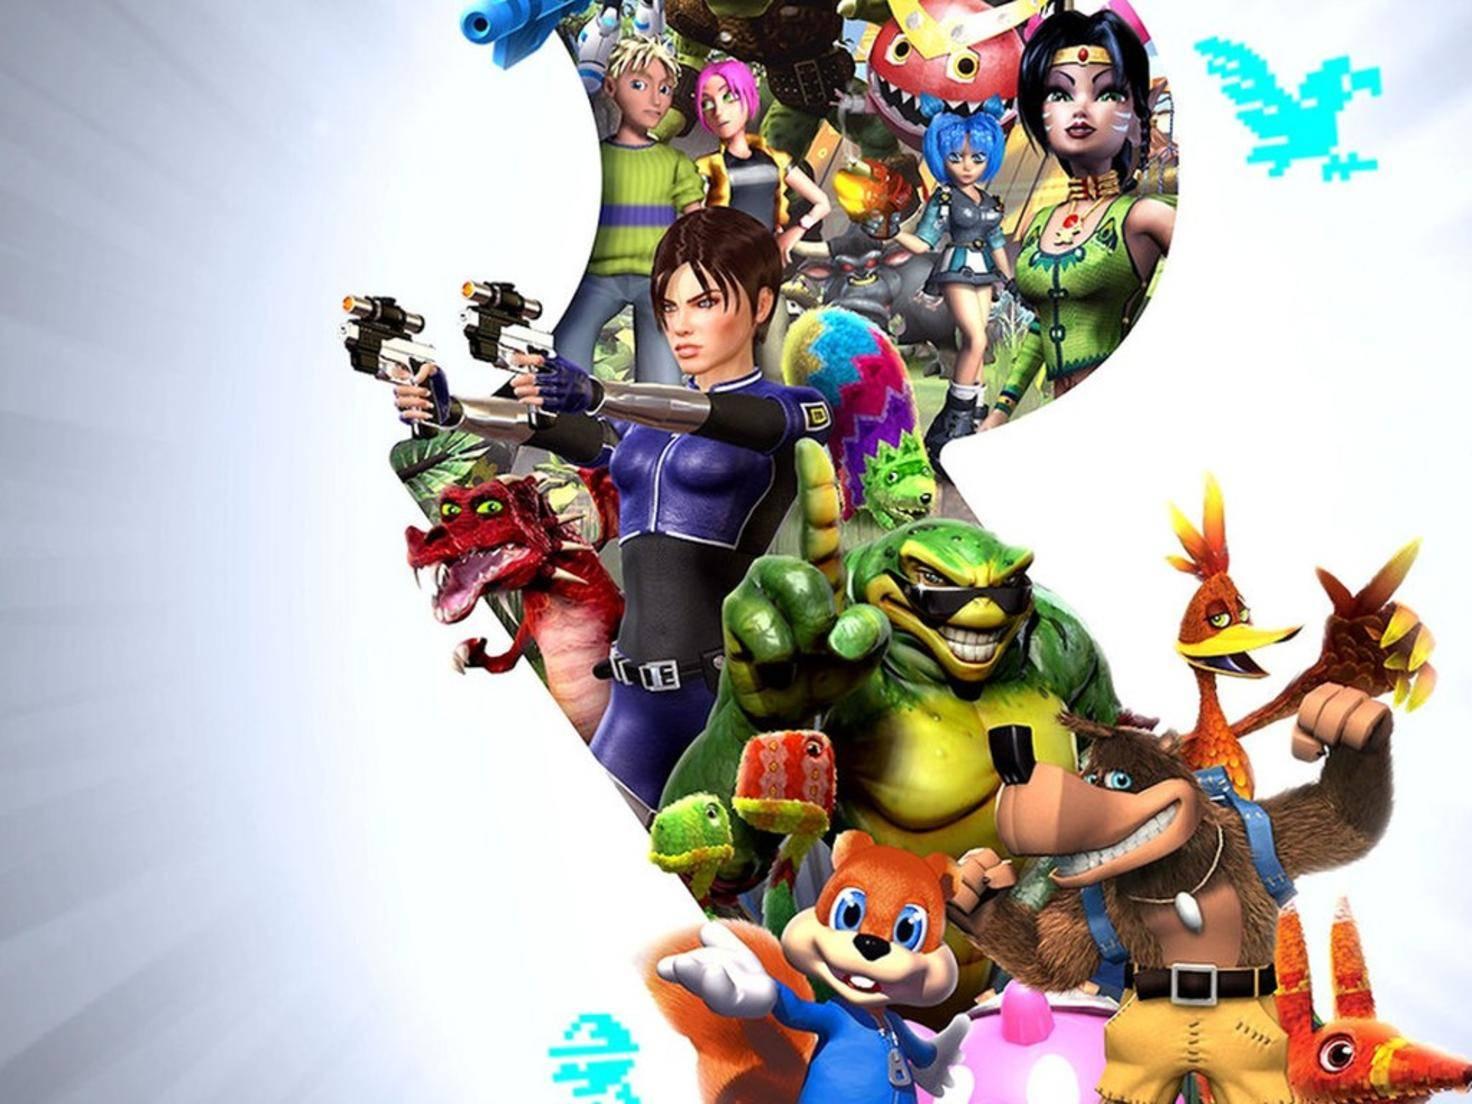 Rare-Replay-Xbox-One-main (1) Teaser.jpg